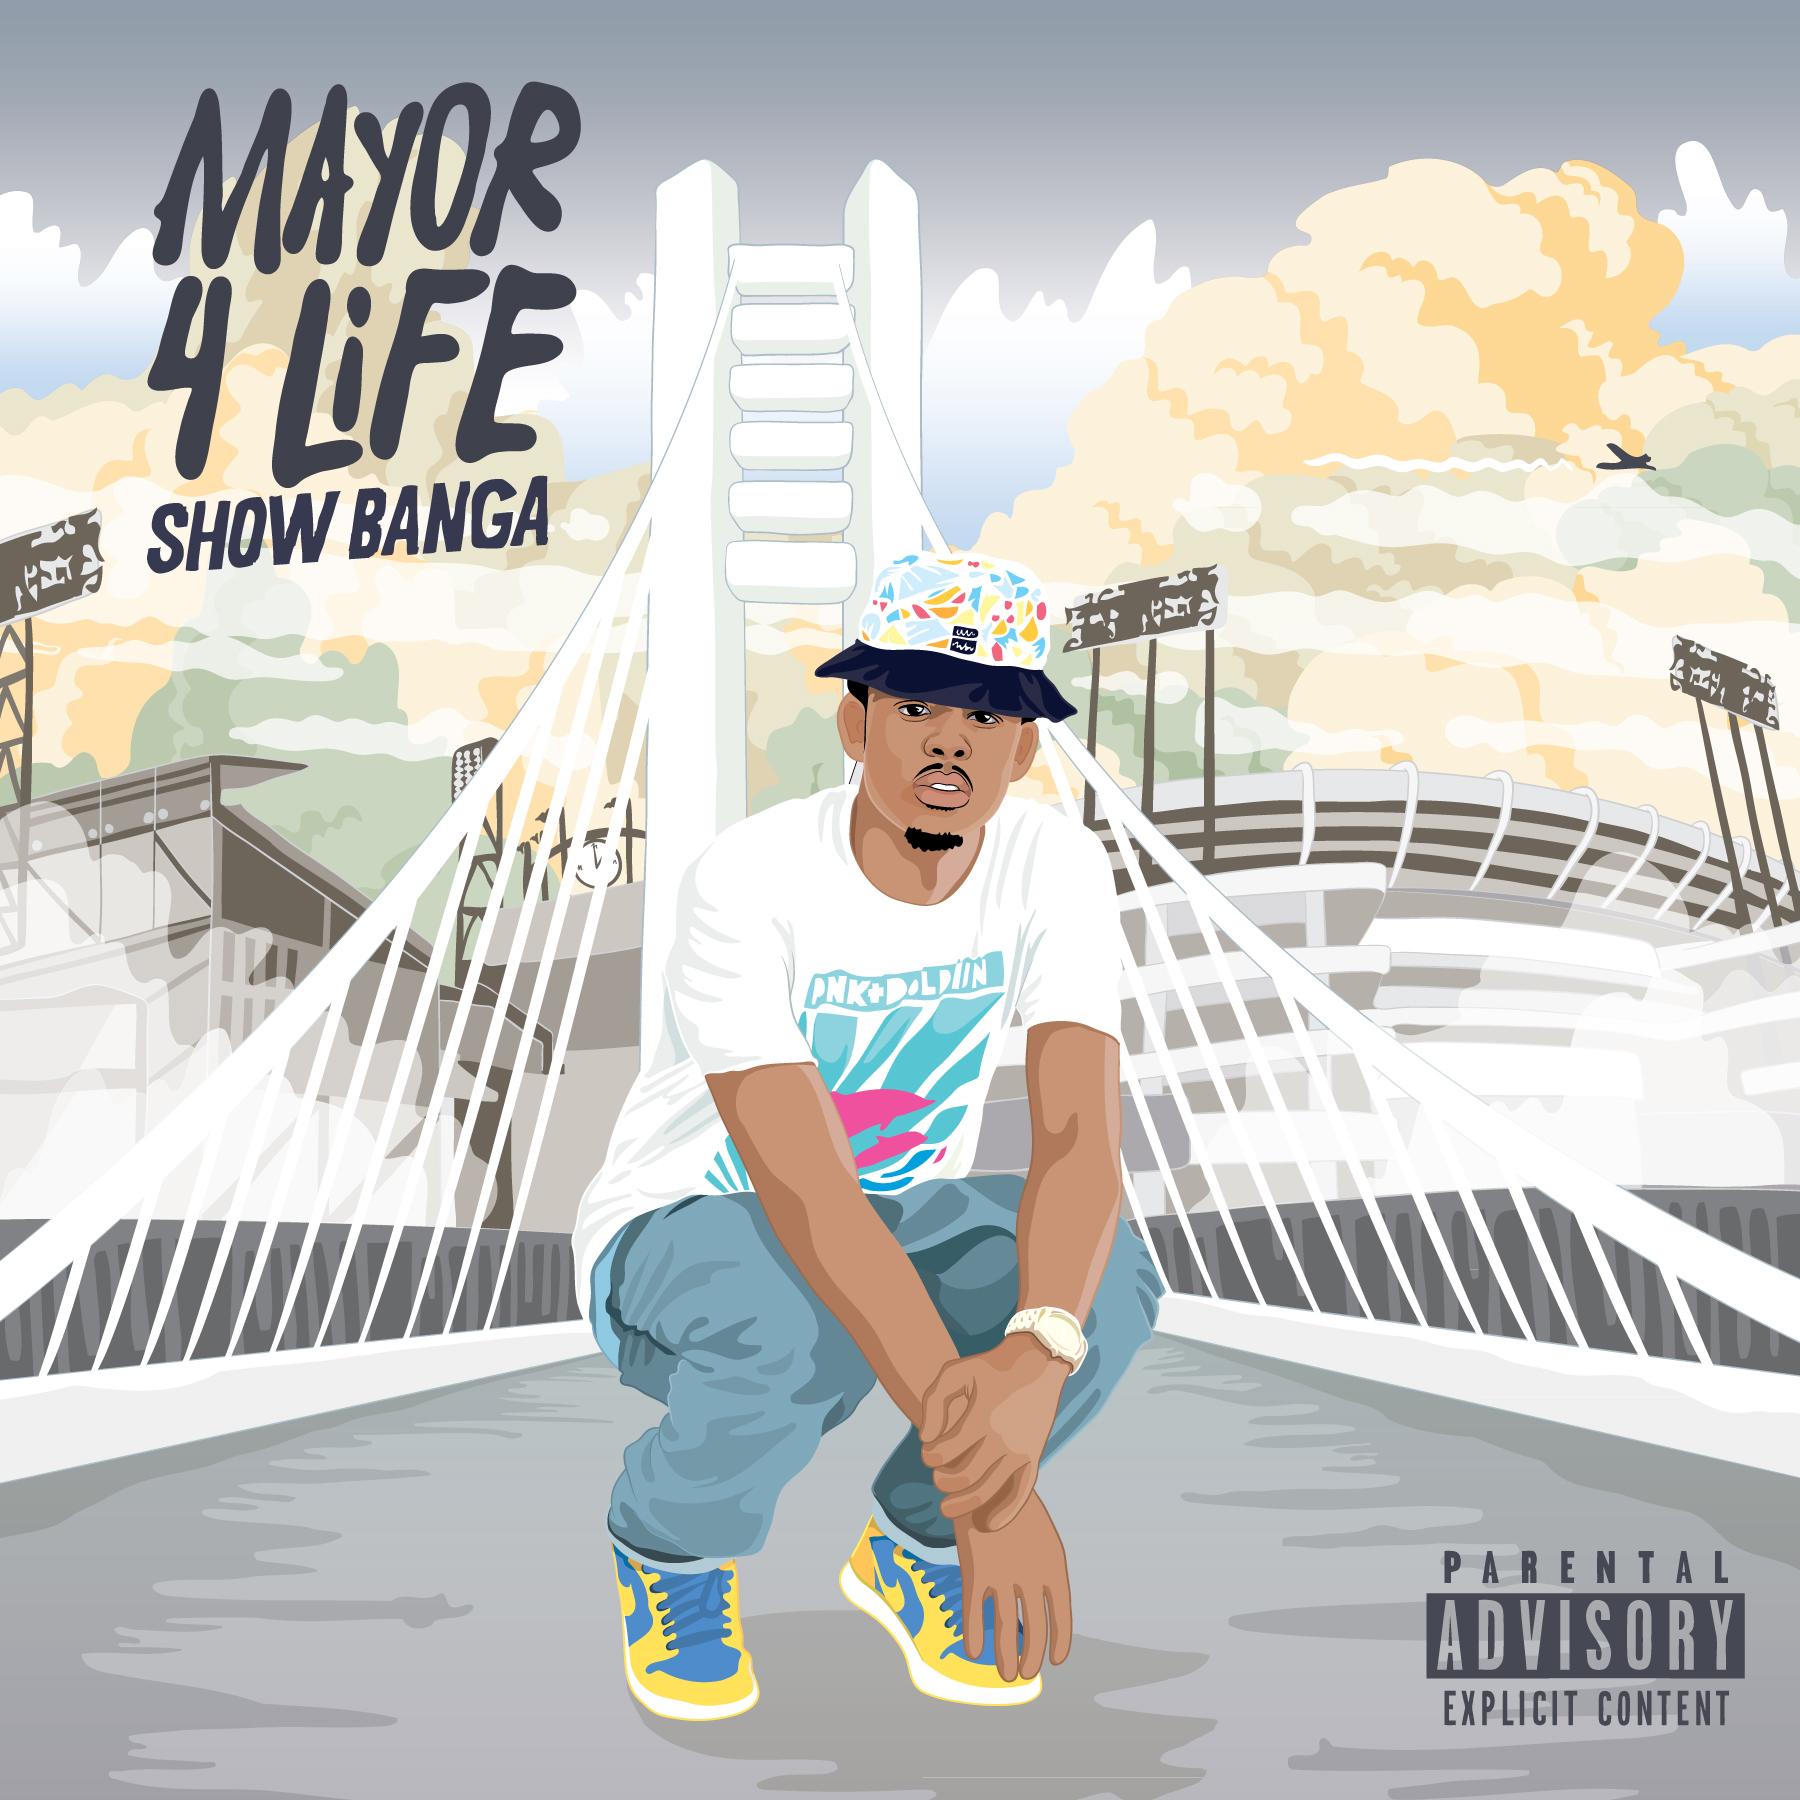 MAYOR 4 LIFE CD - $10